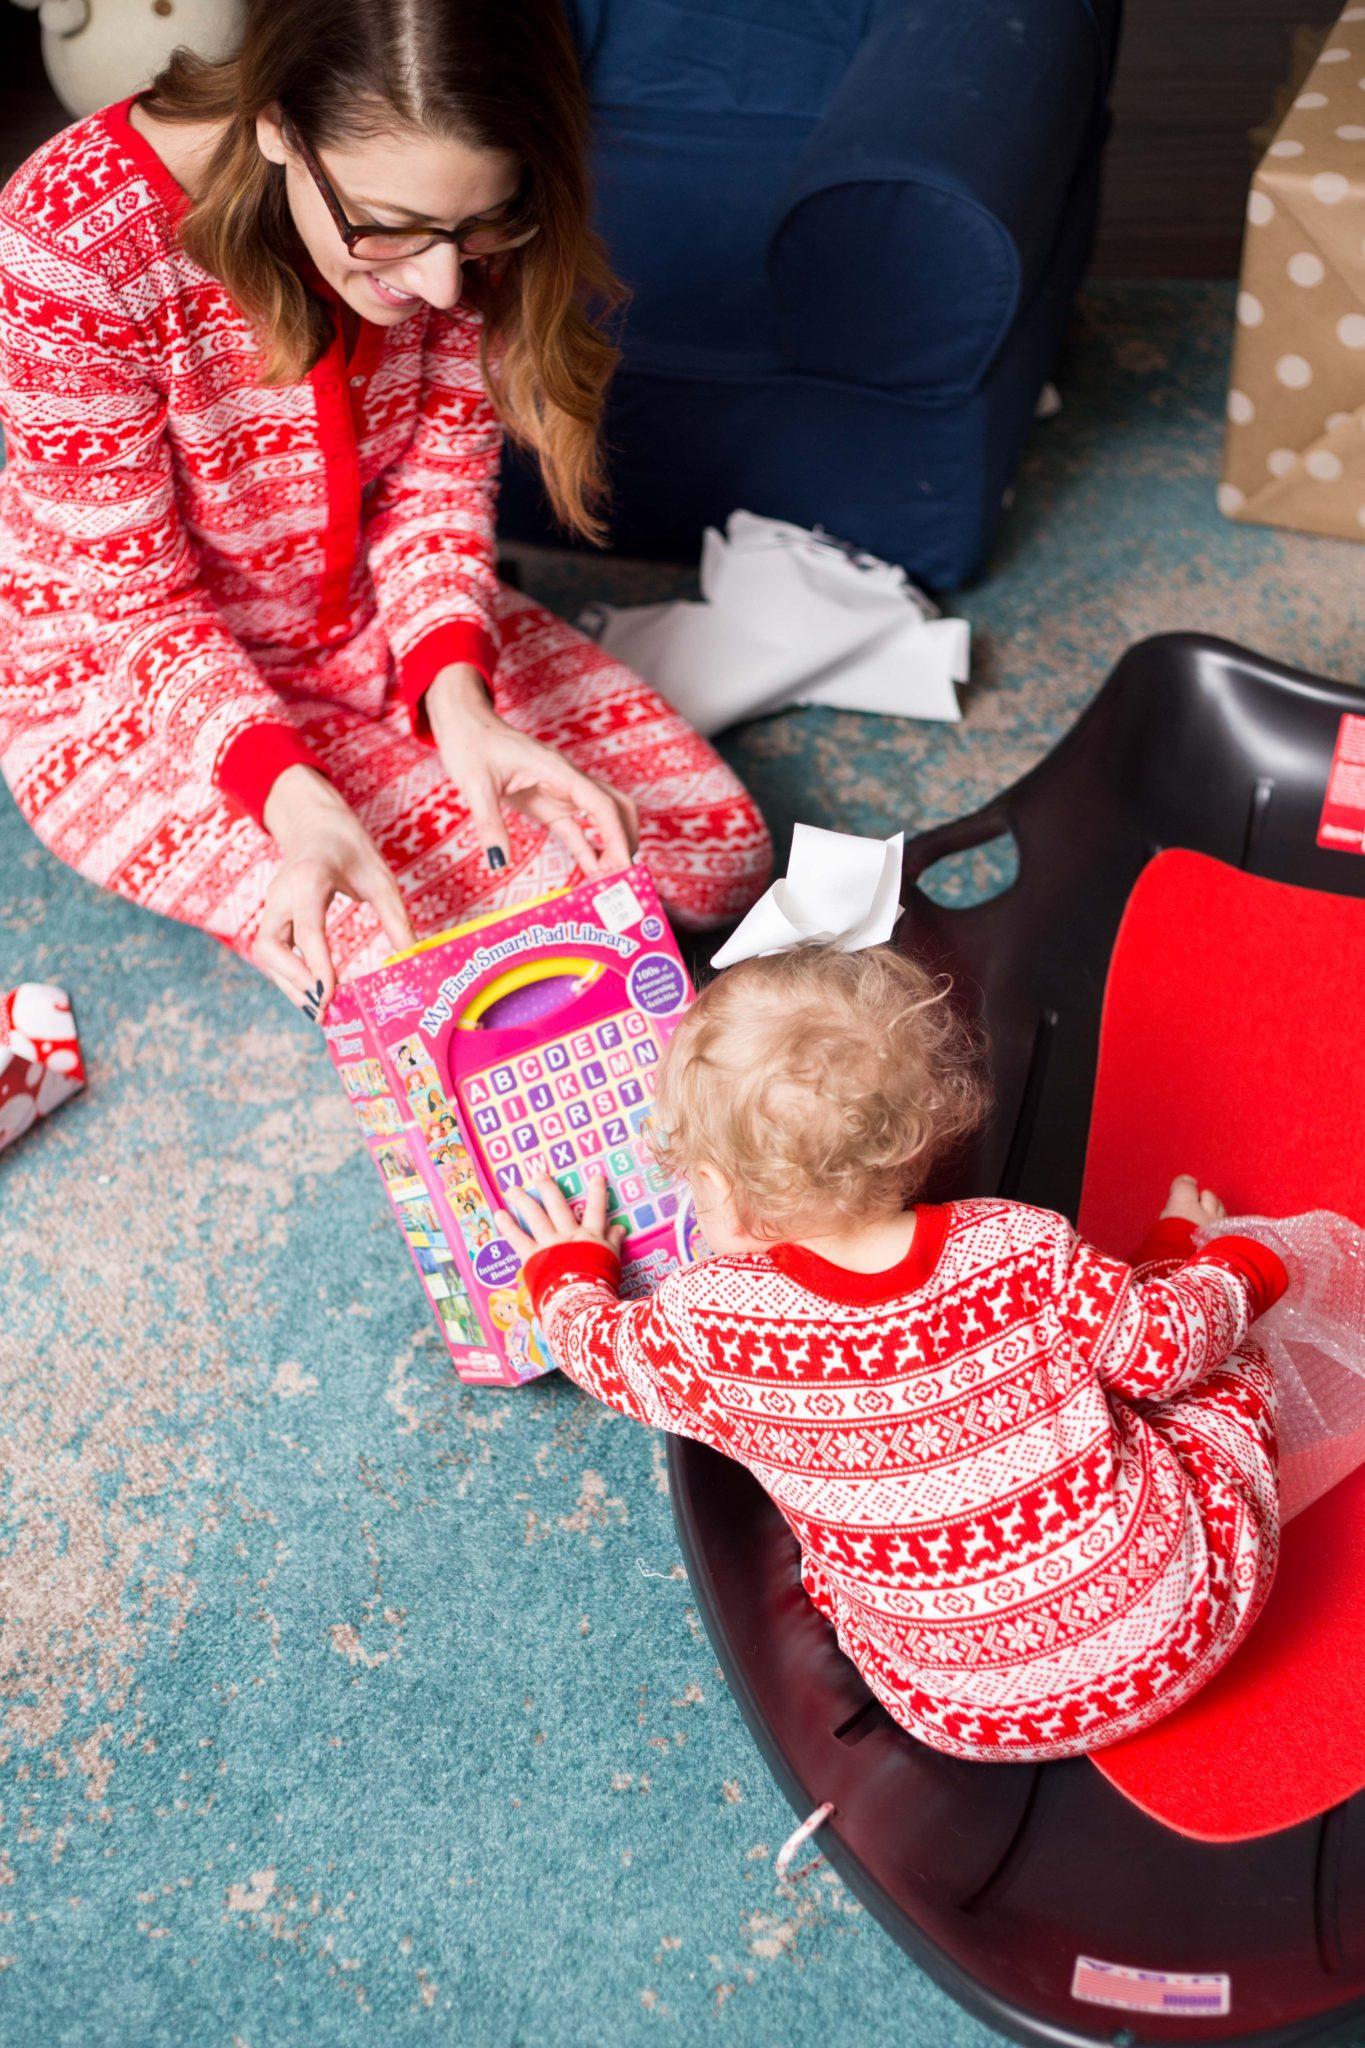 christmas photography | family photography | lifestyle photography | allweareblog.com